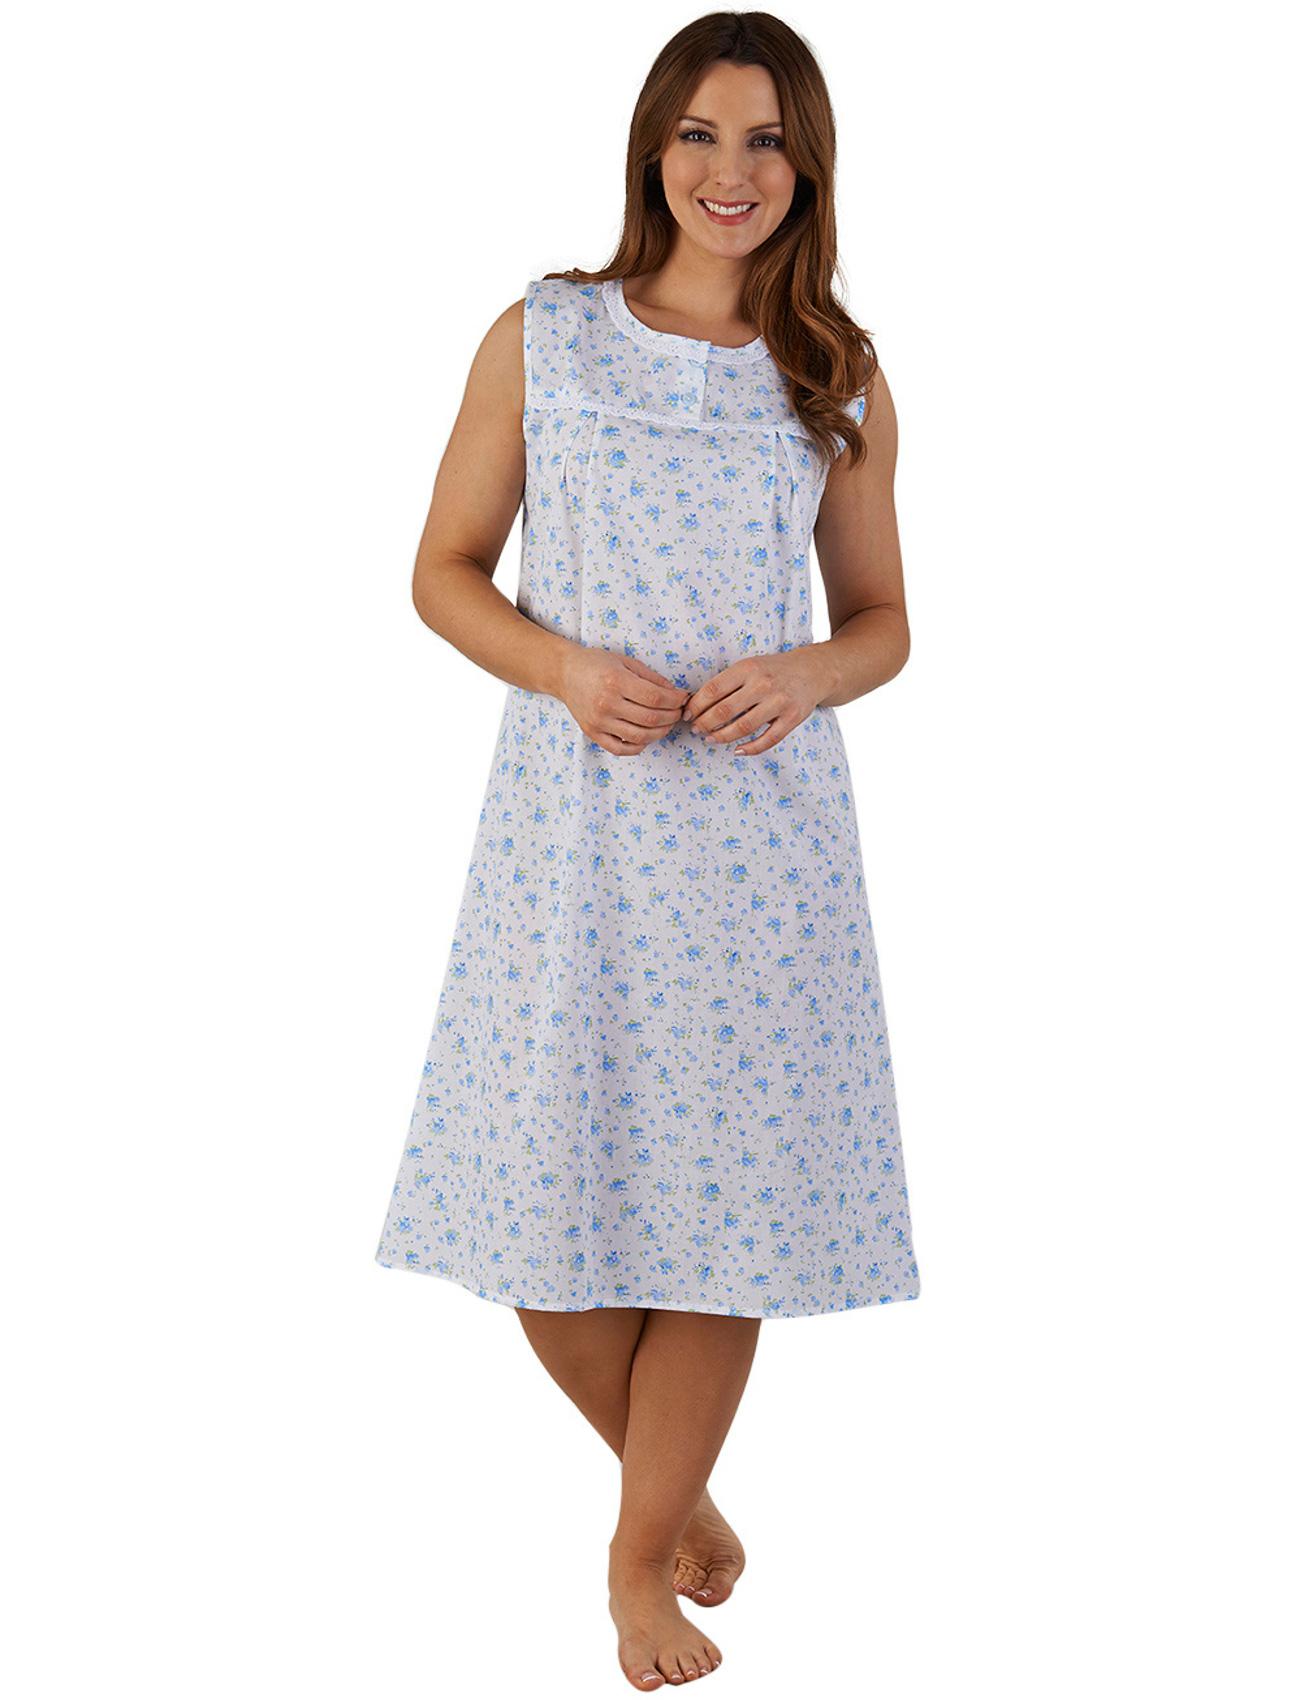 4d6f0732f Womens Night Dress Floral Sleeveless Slenderella Ladies Lace Trim Flower  Nighty